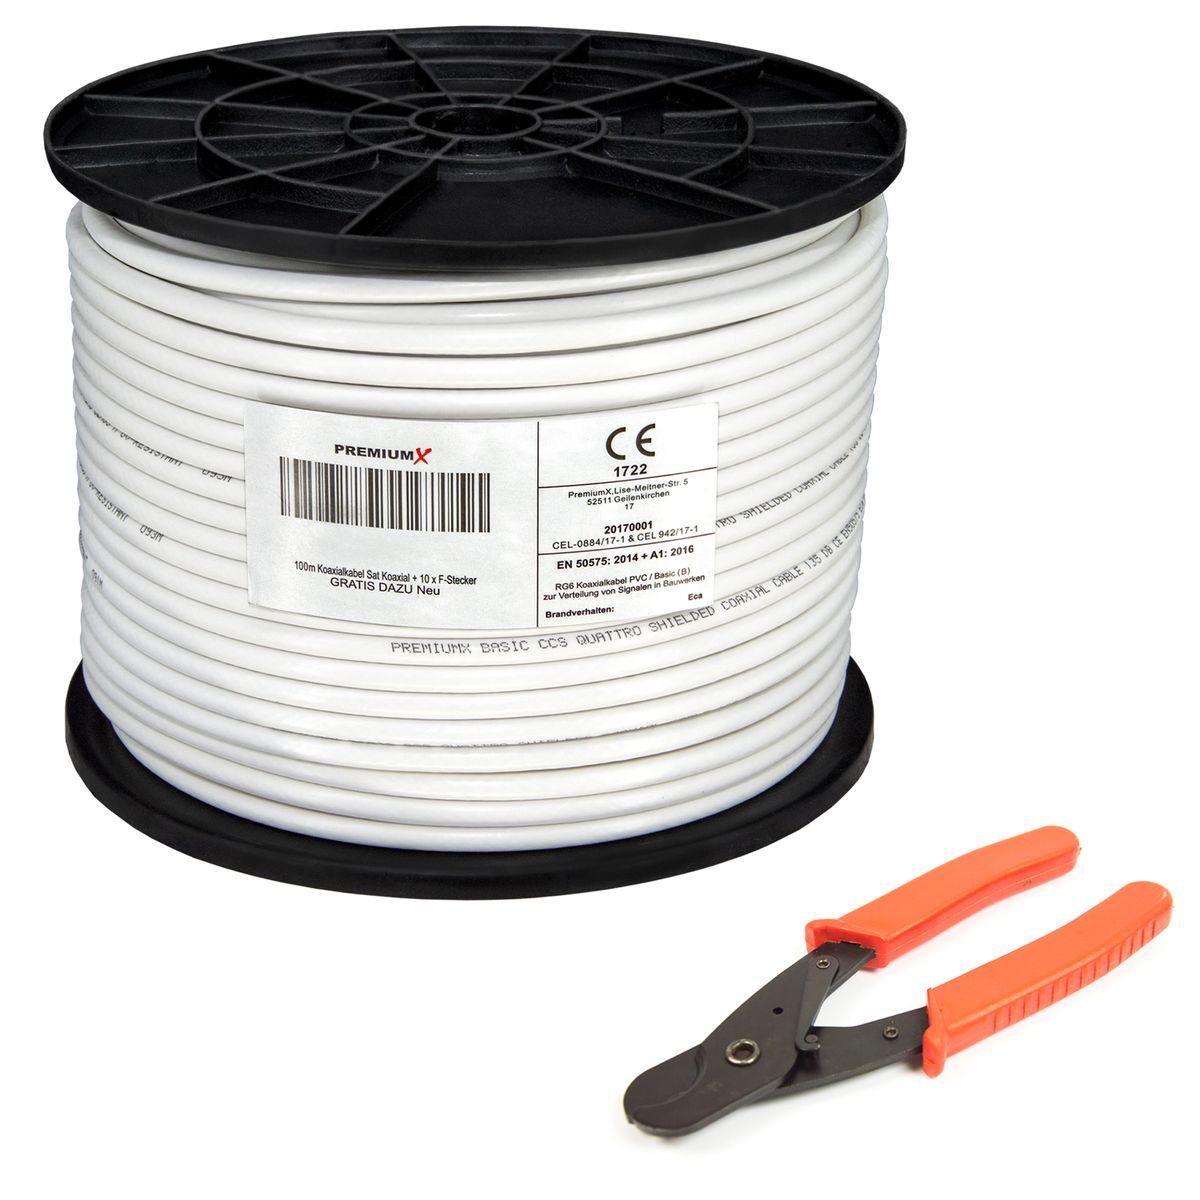 100m SAT Kabel Antennenkabel 4 fach 135dB DIGITAL Koax Koaxialkabel 135 FULL HDT